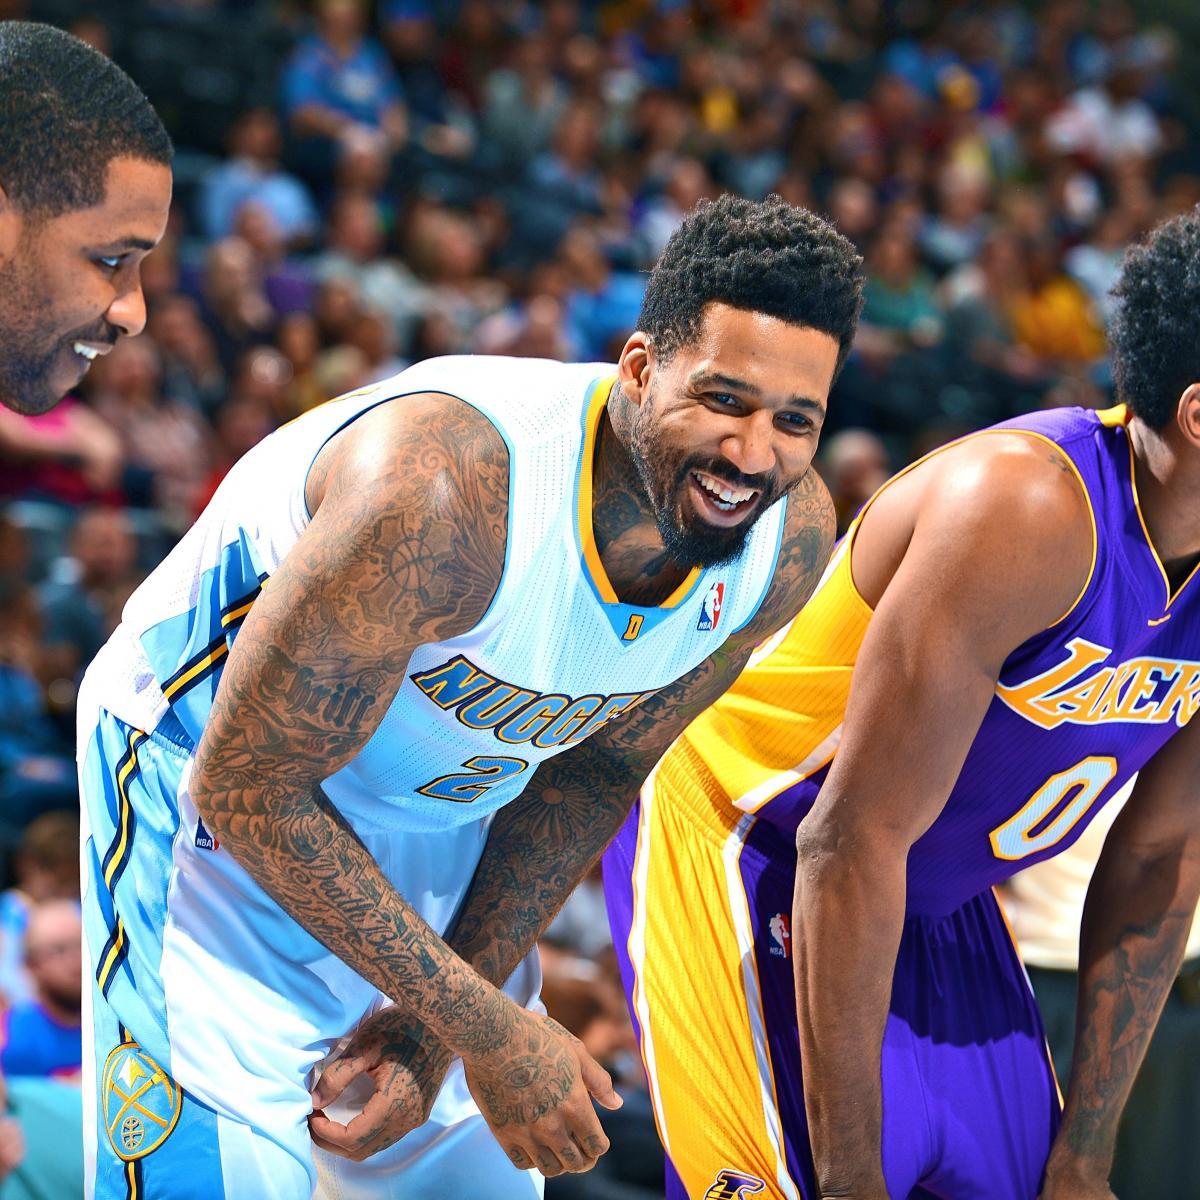 Nuggets Quarter Season Tickets: Denver Nuggets Vs. Los Angeles Lakers: Live Score